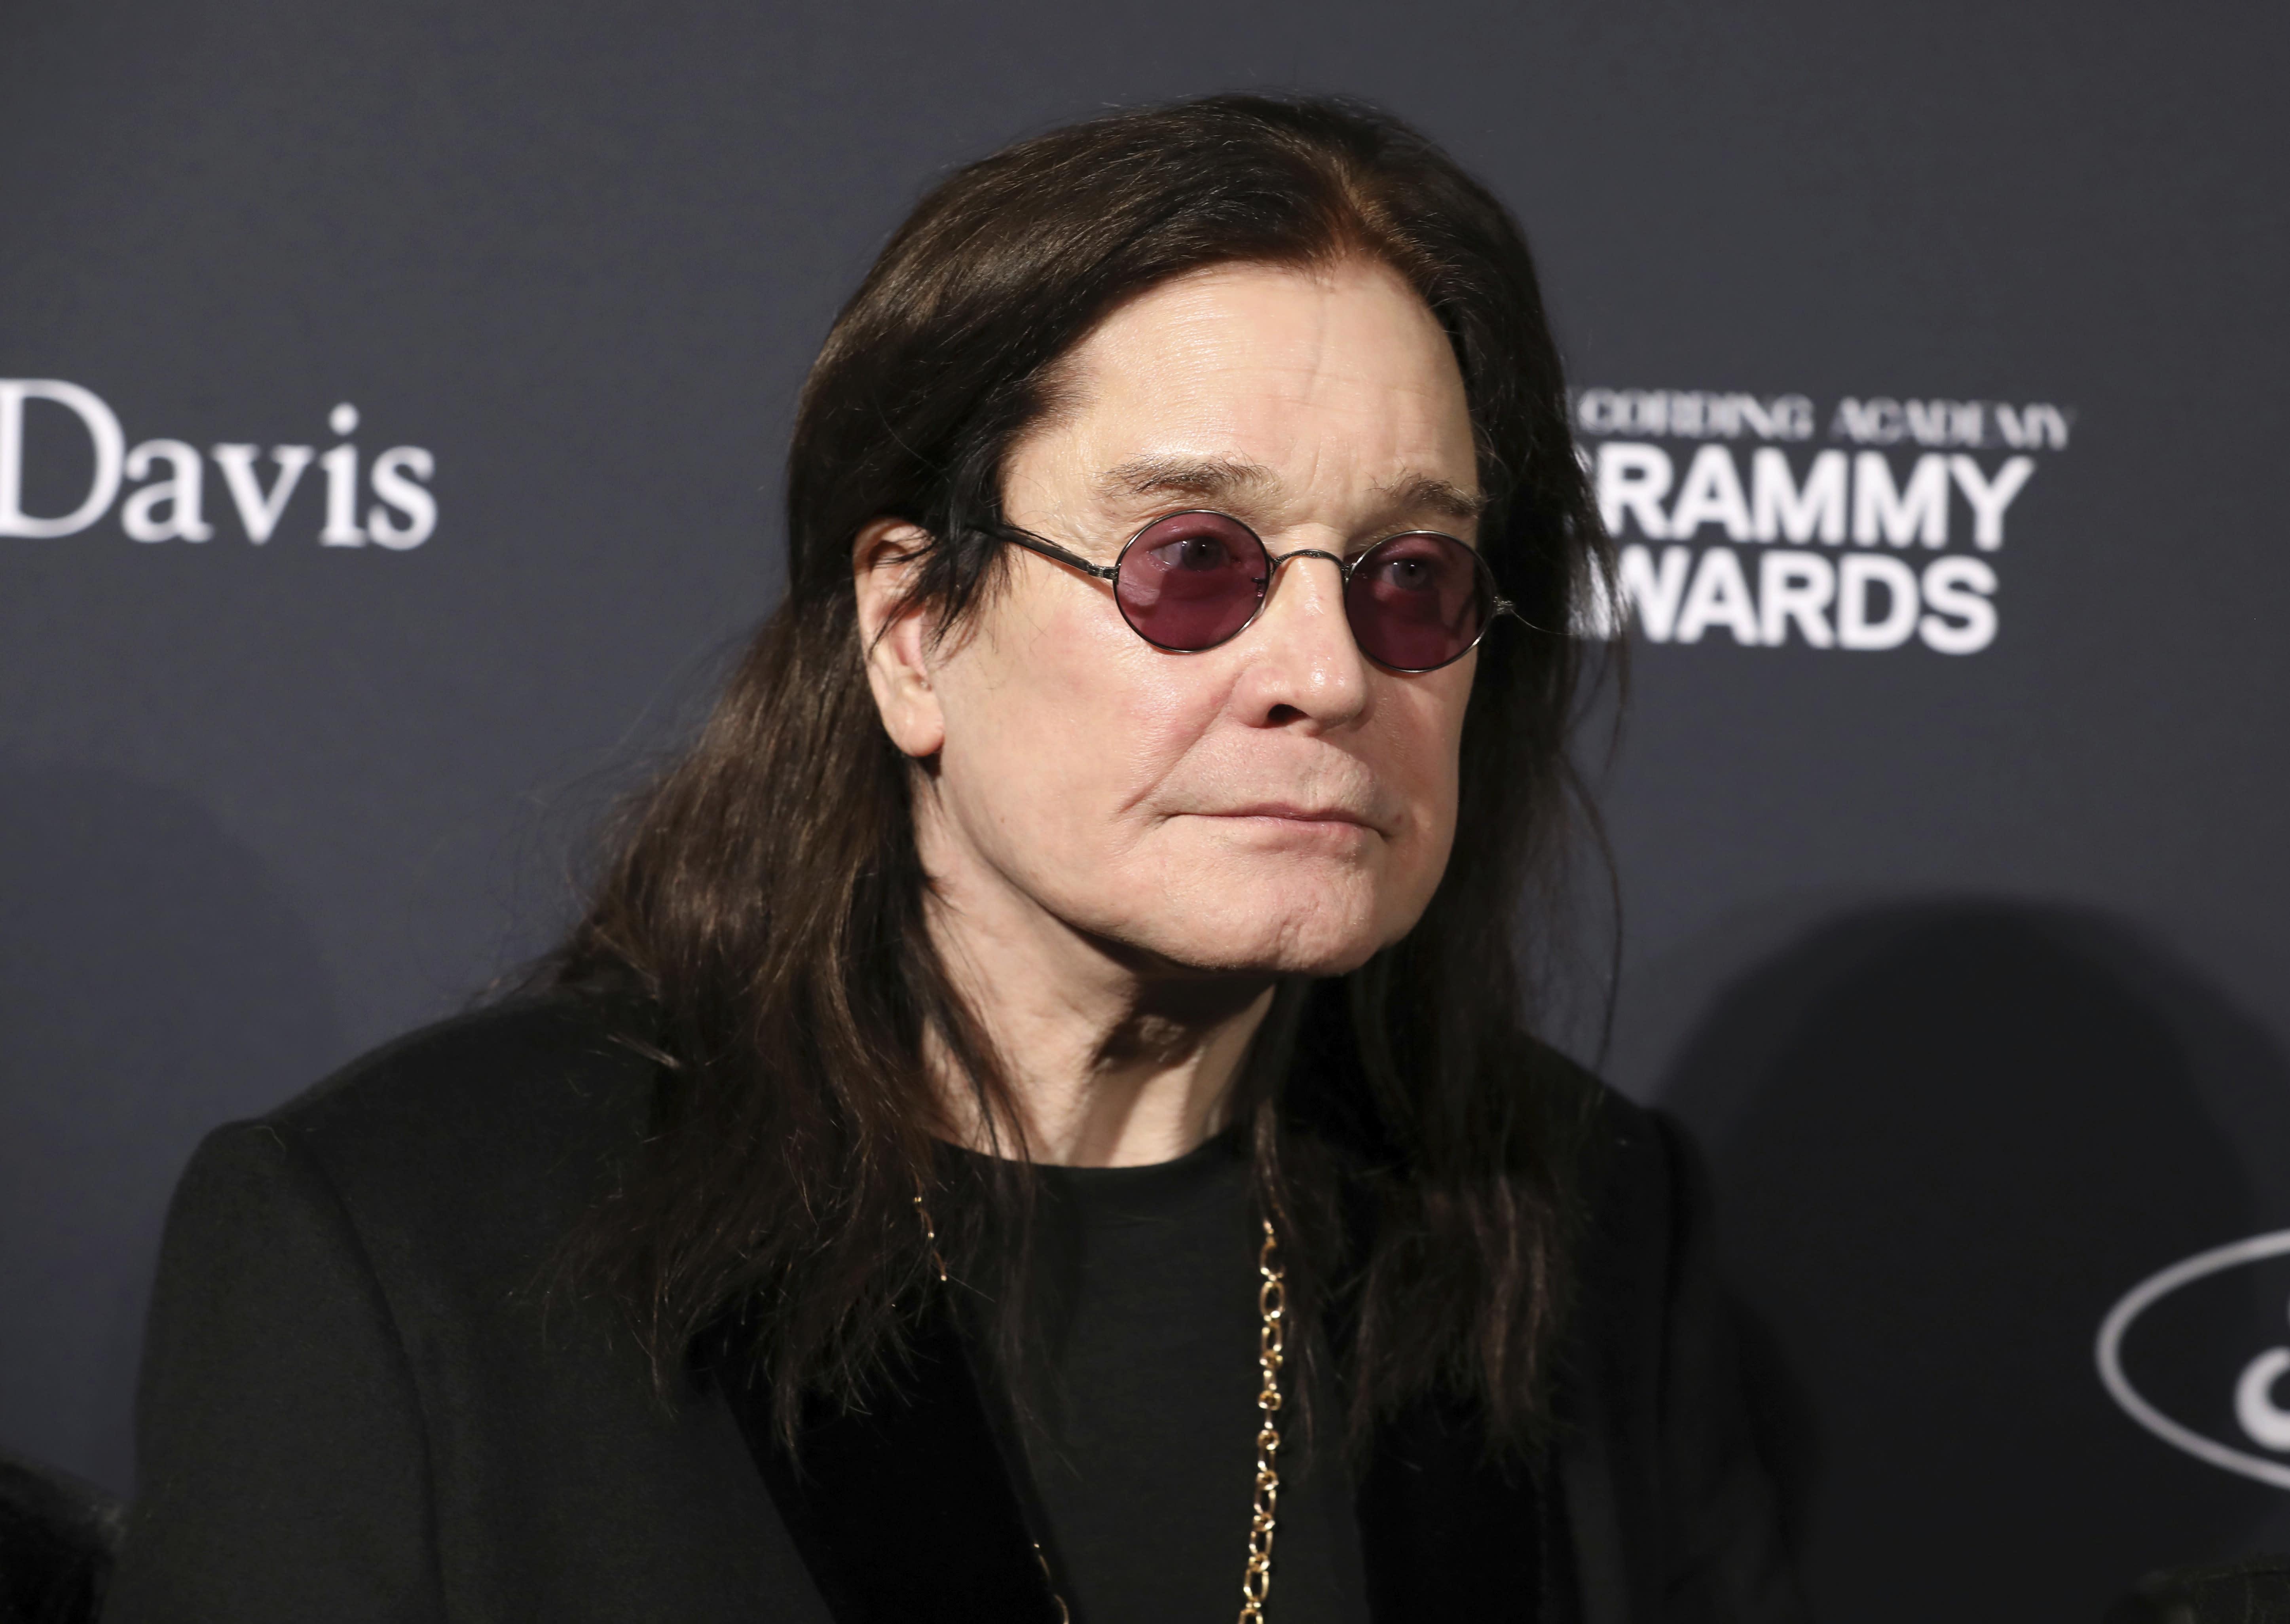 Ozzy Osbourne cancels US tour to undergo treatment for Parkinson's